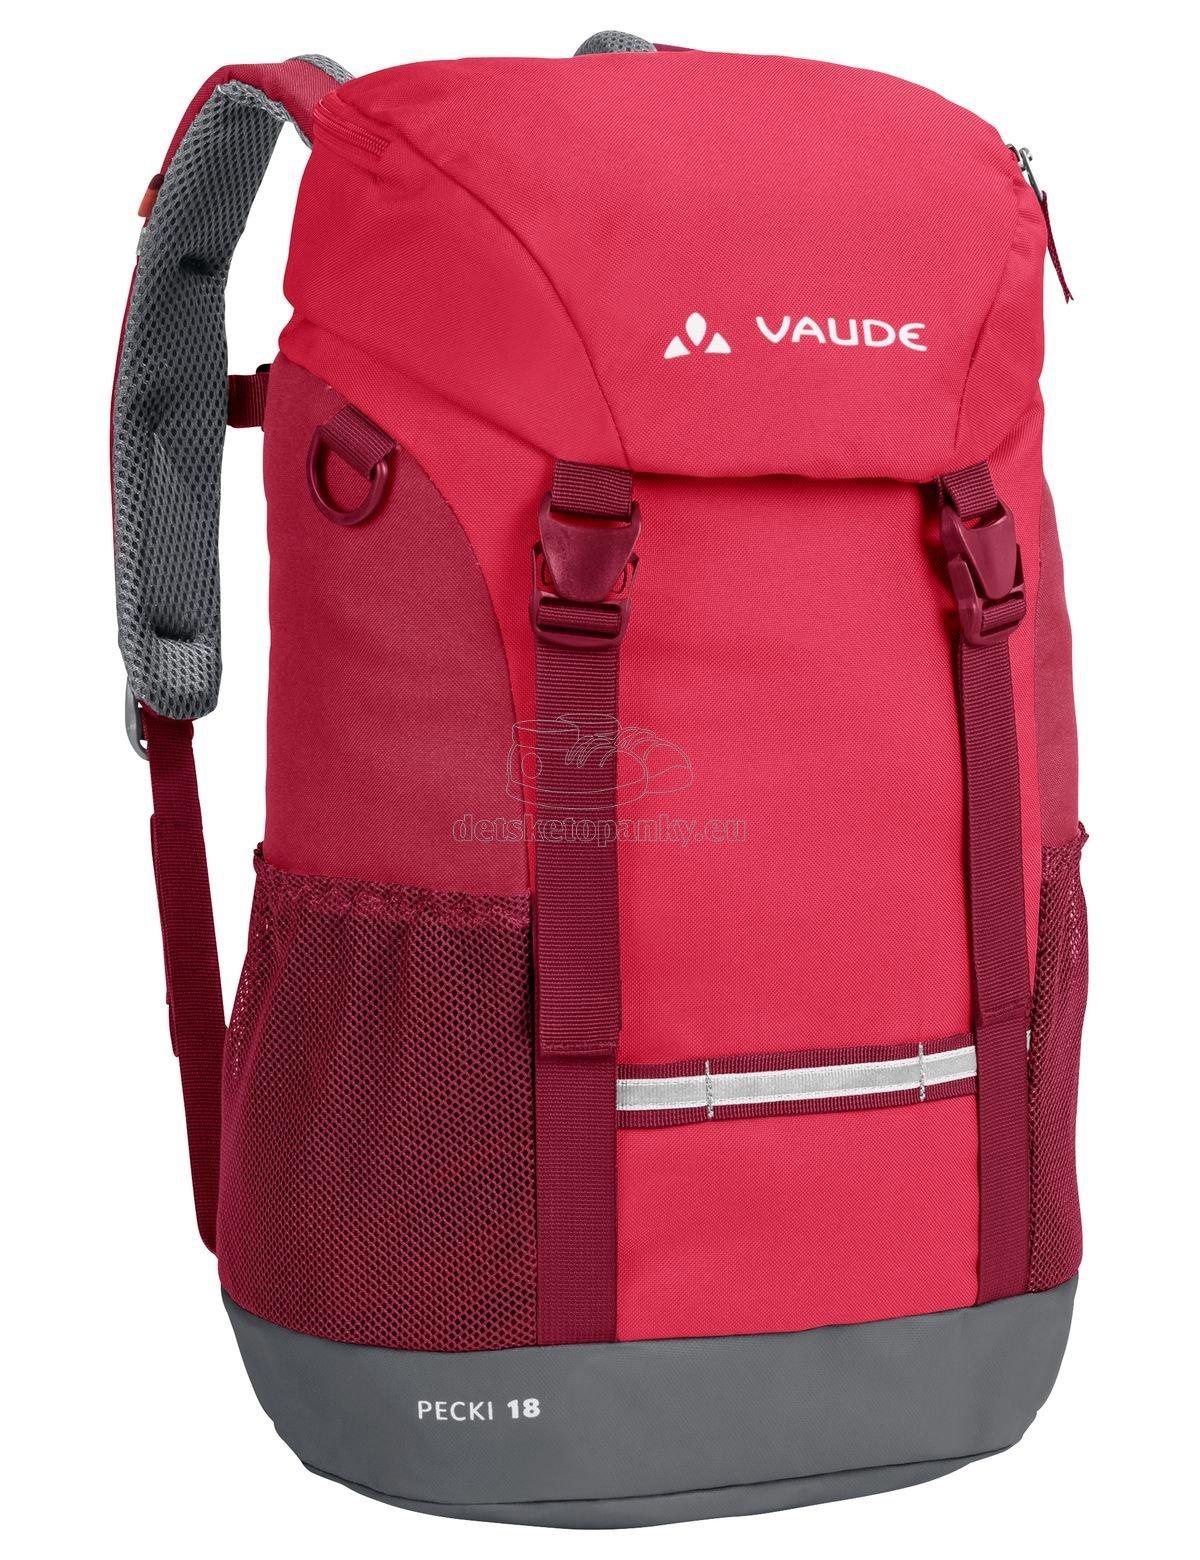 Vaude Pecki 18 bright pink